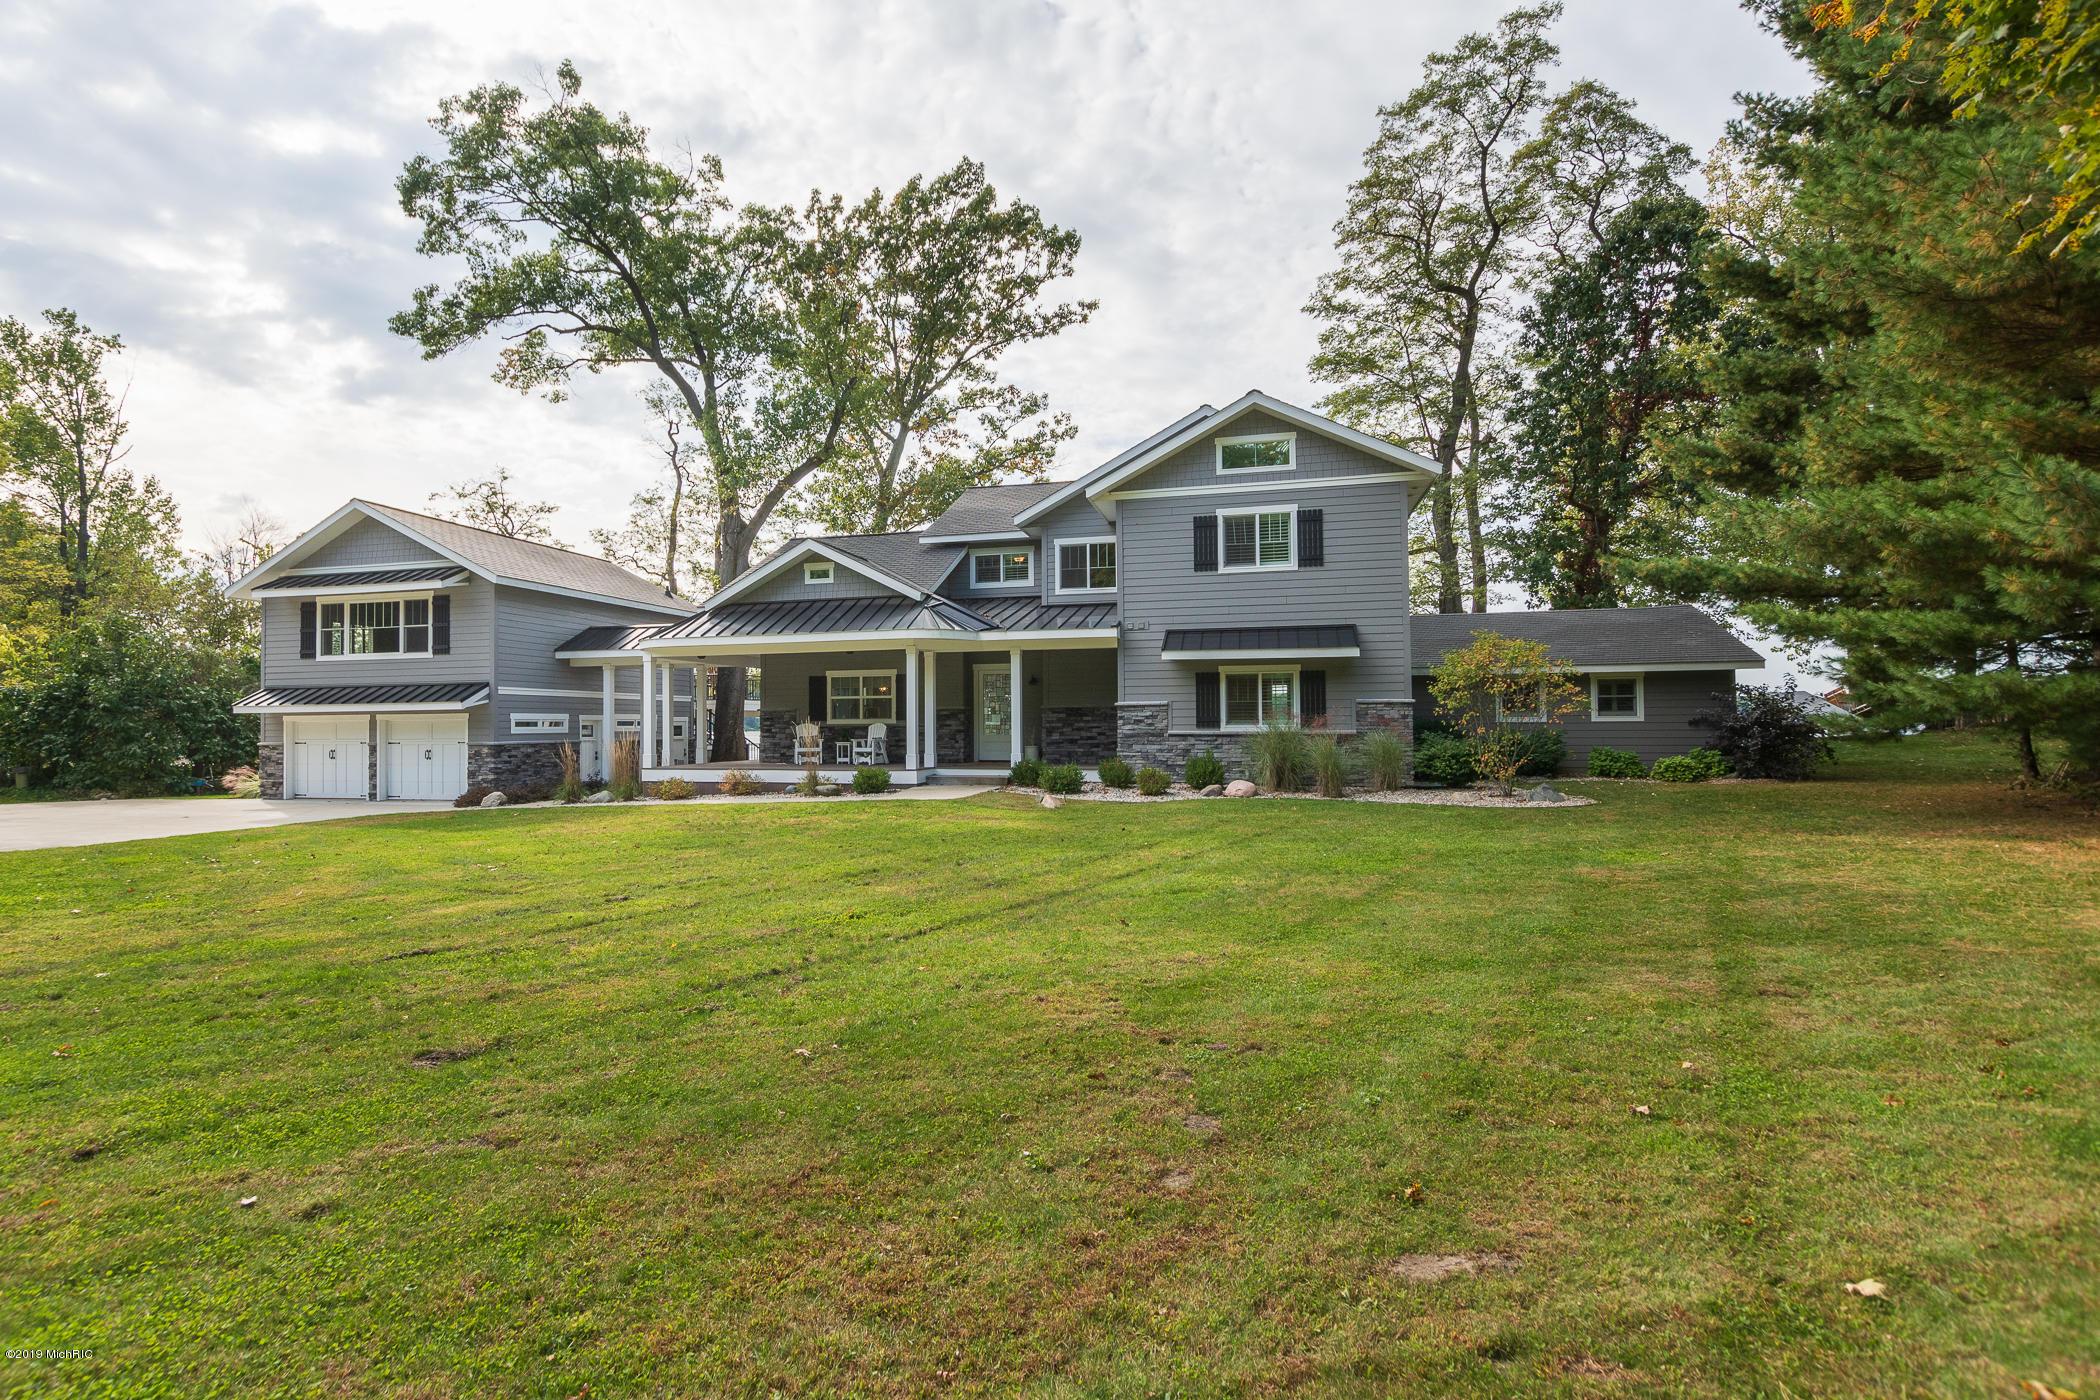 Real Estate for Sale | Jaqua Realtors